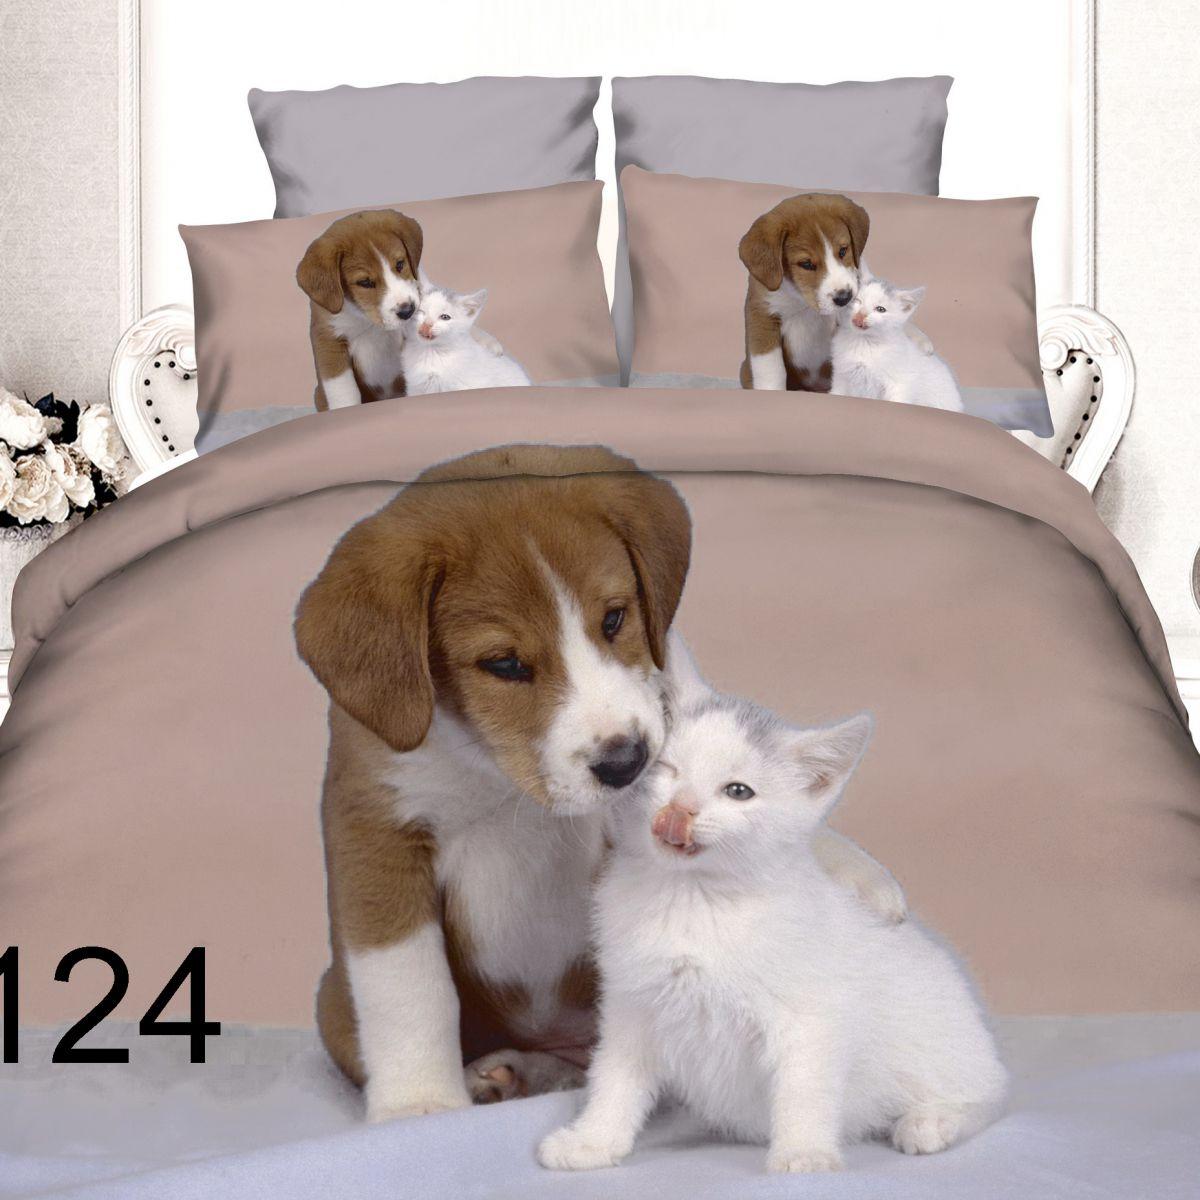 3D Beddings - Antonio - AML-124 - 160x200 cm - 4 pcs